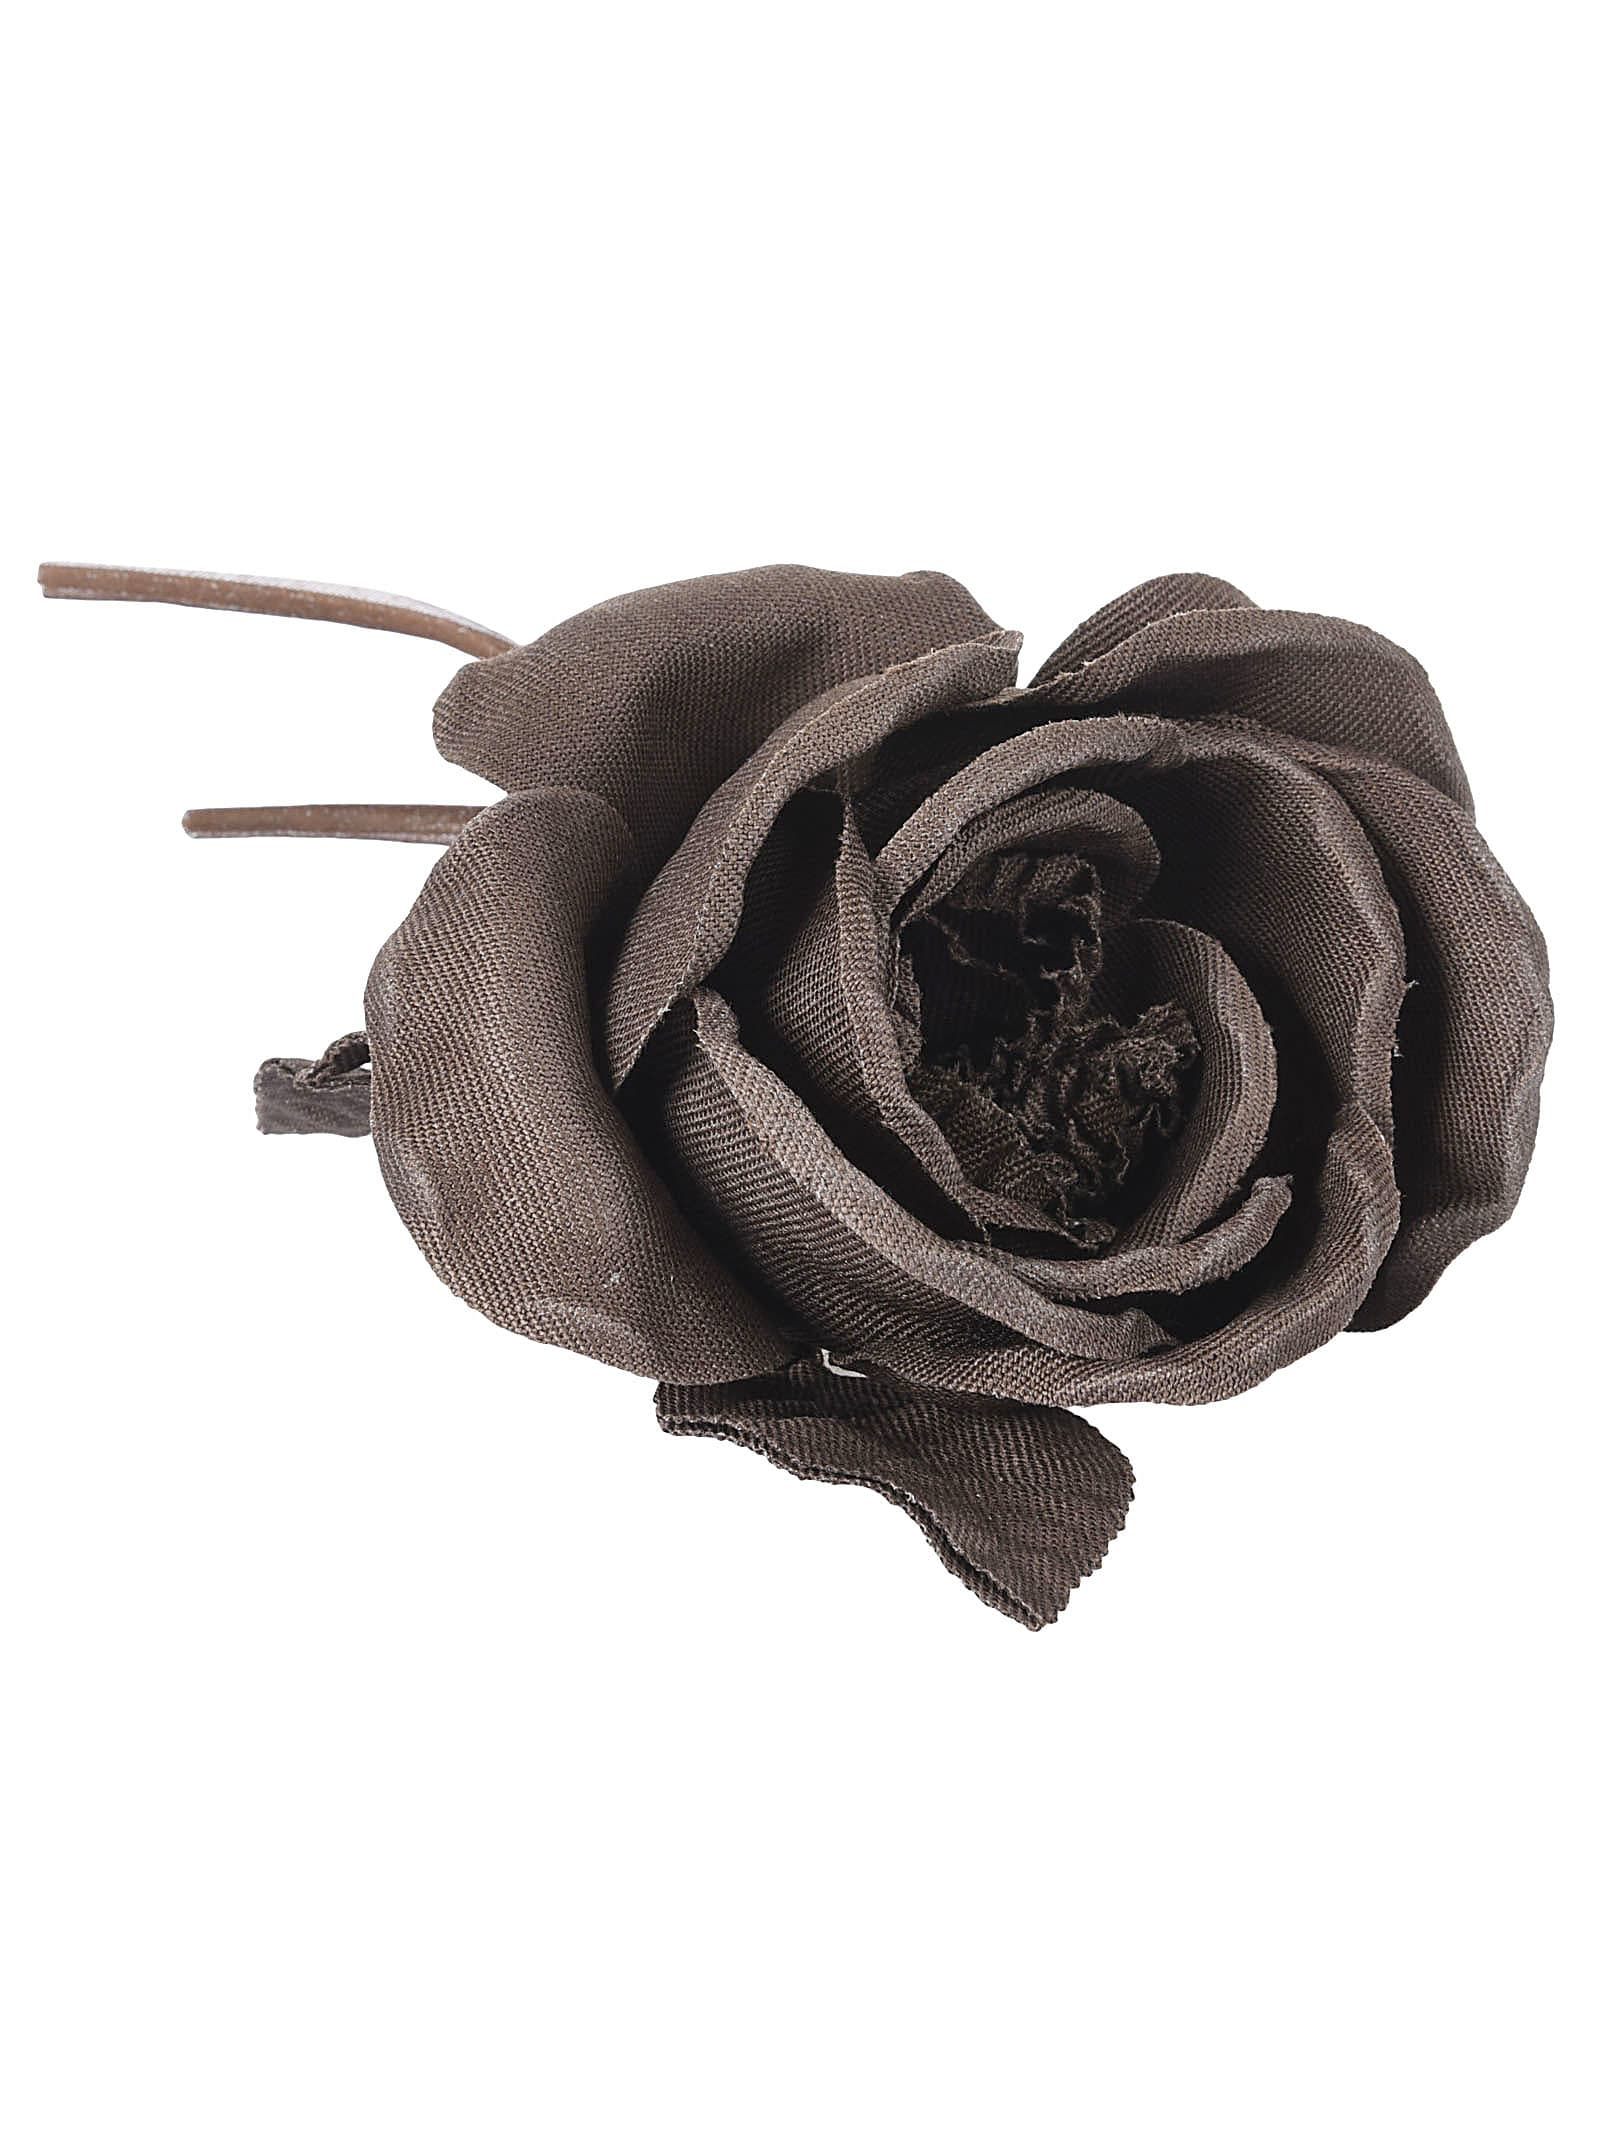 P.a.r.o.s.h. Flower Brooch In Brown